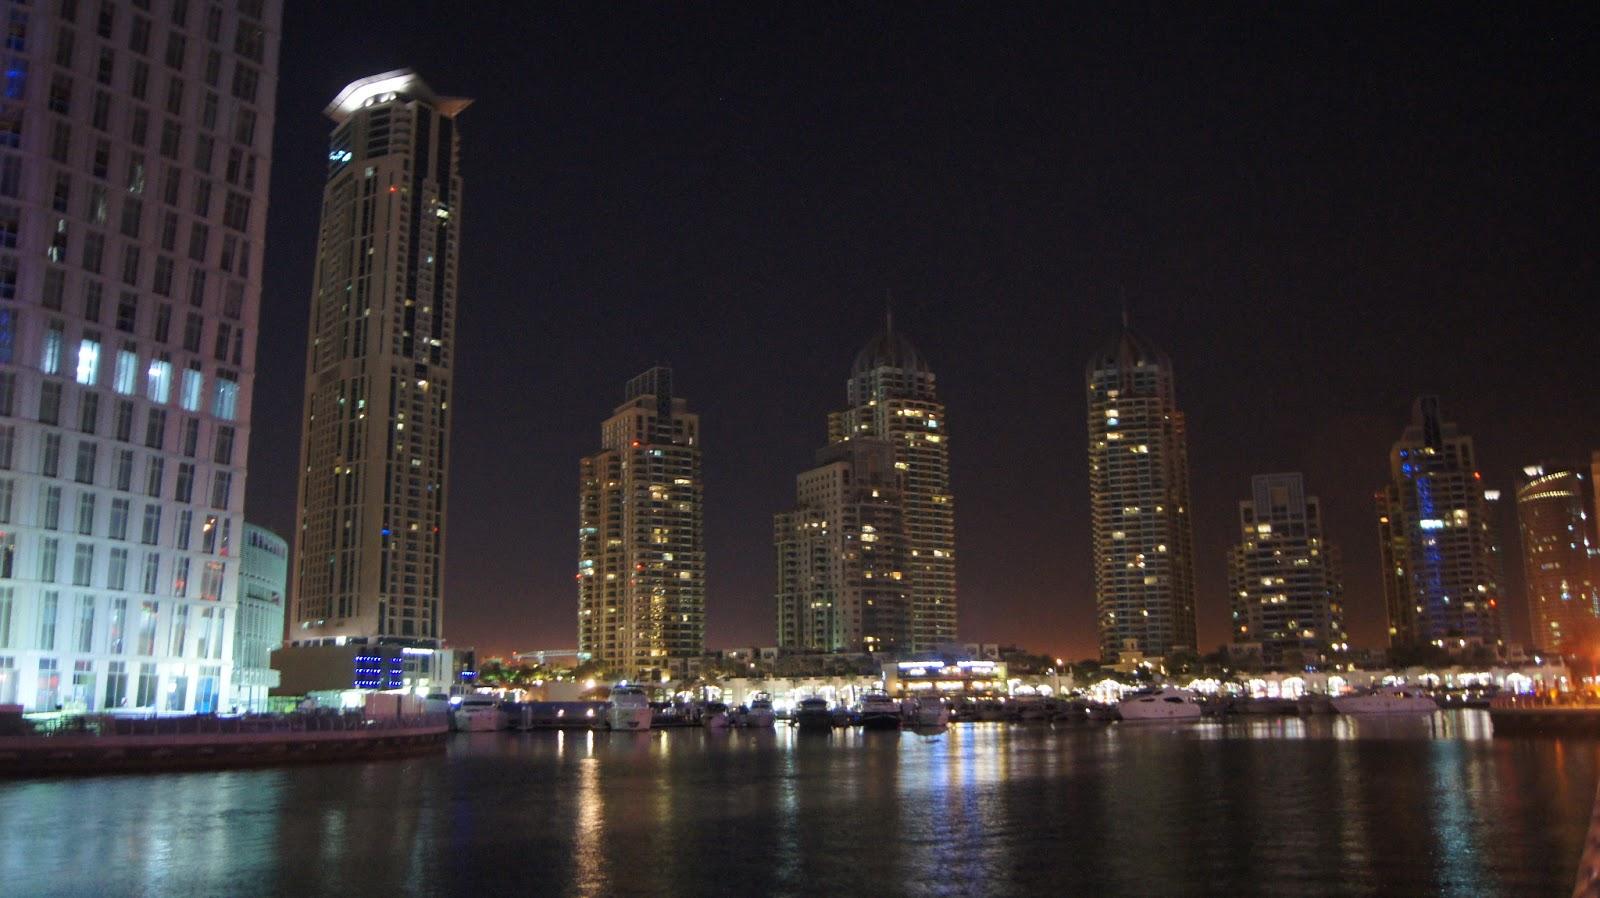 New Year´s Eve in Dubai: Let´s Party | La Otra columna de Carrie